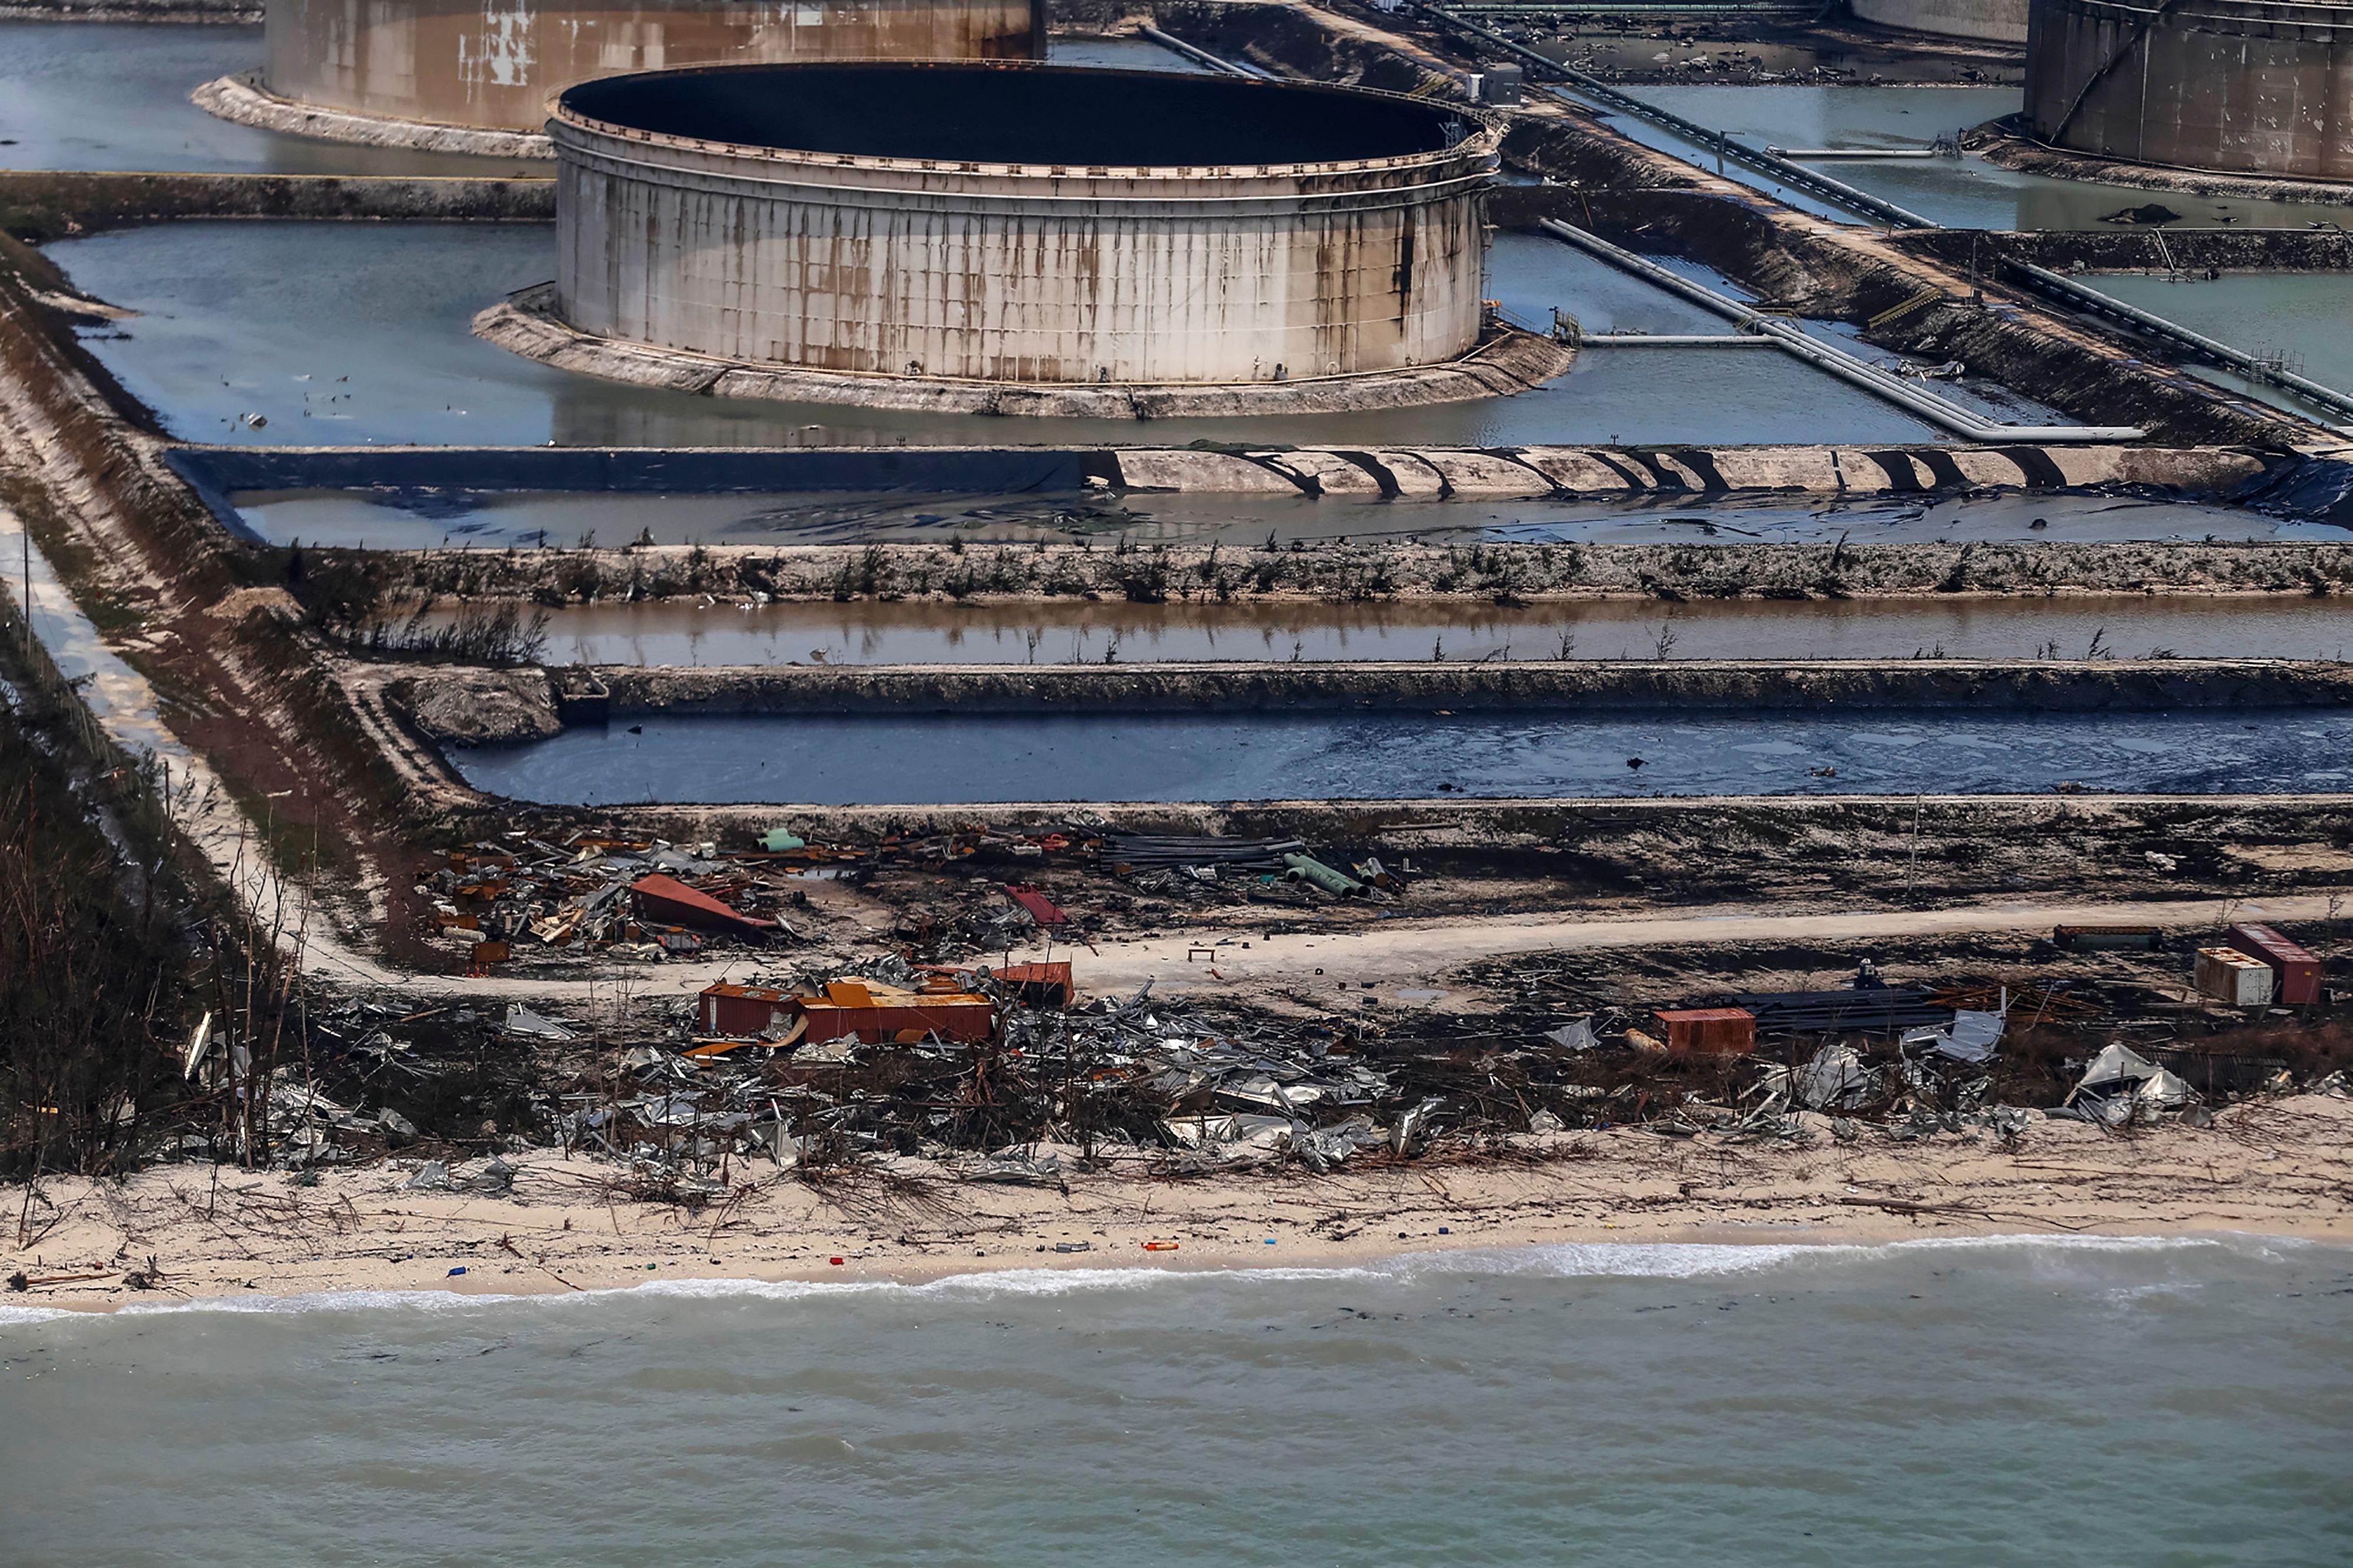 Hurricane Dorian Causes Oil Spill in Bahamas | Time